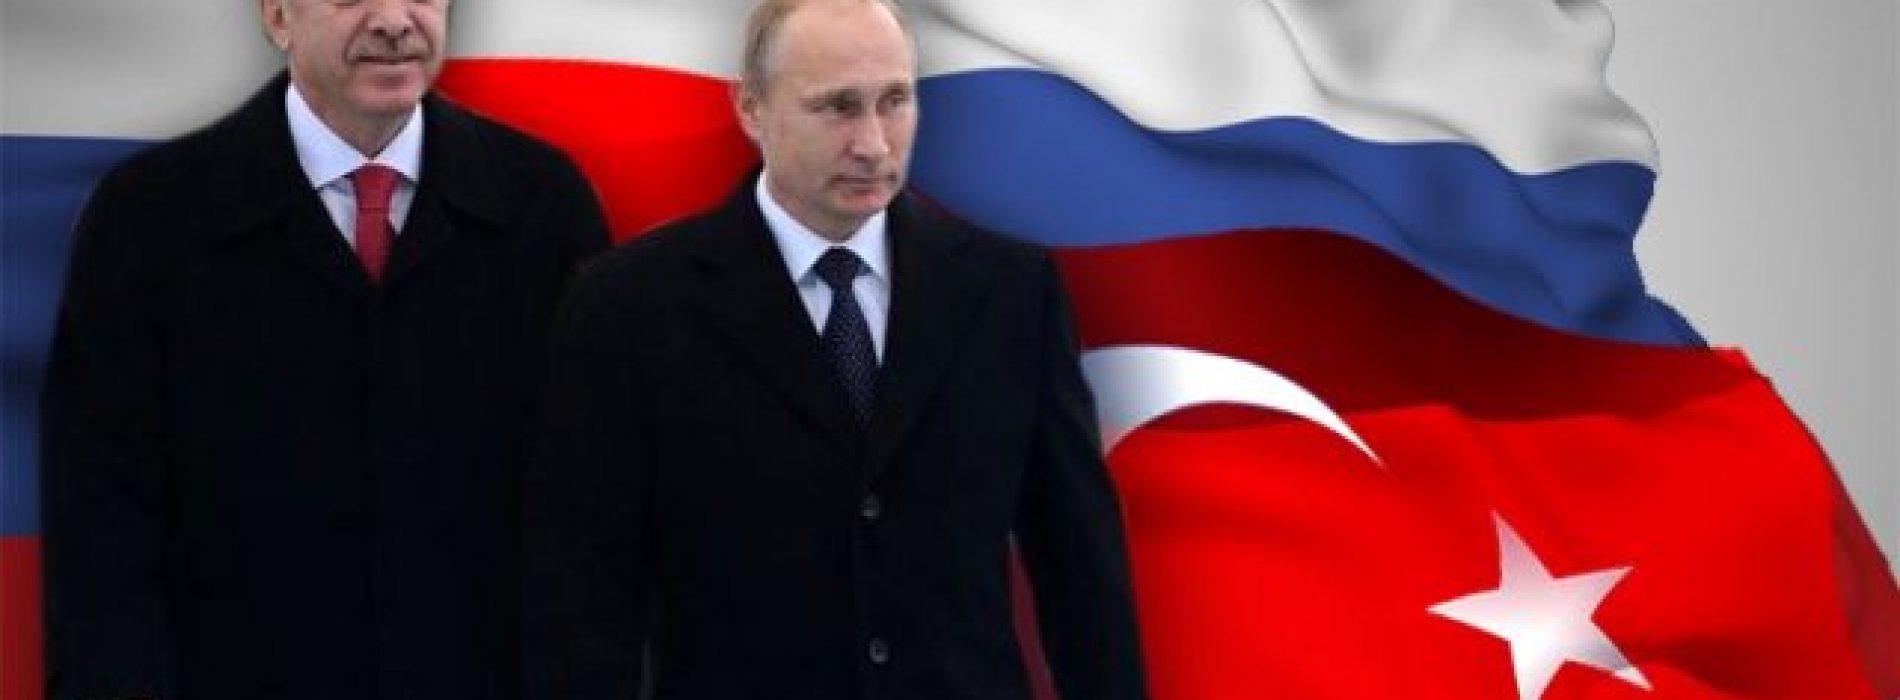 Rusyaya Kimlikle Giriş Yolda